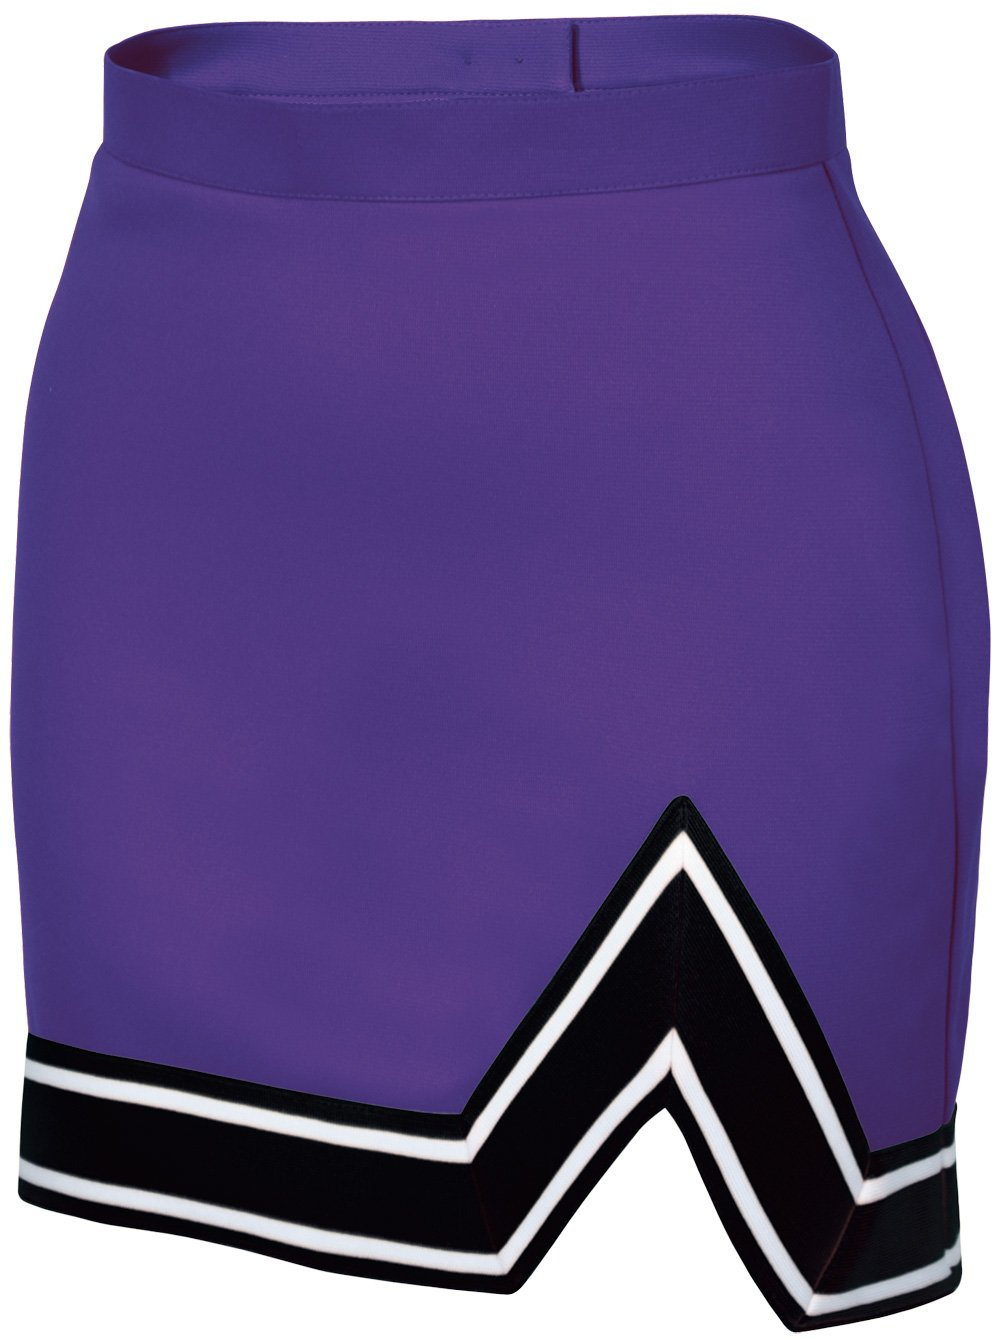 Chassé Womens' Blaze Skirt Purple/White/Black Adult X-Small